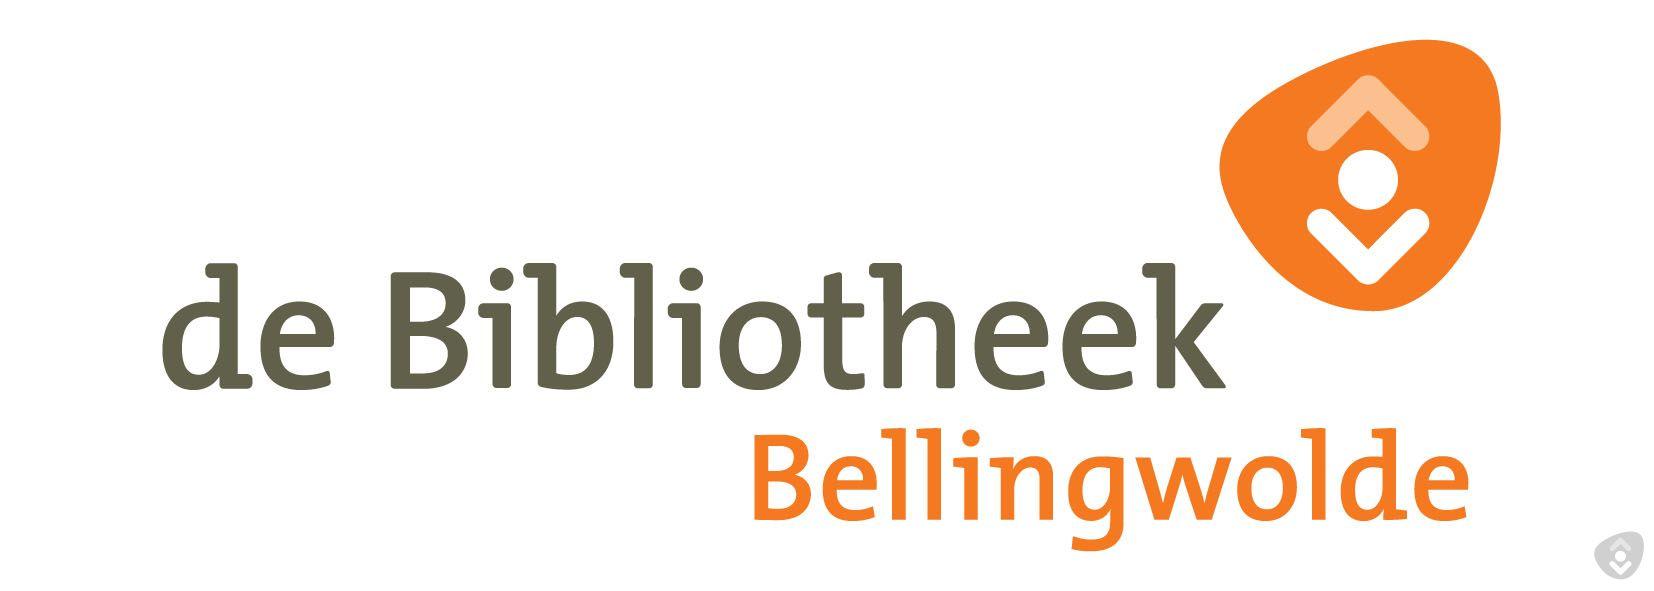 Biblio_lang_RGB_Bellingwolde.jpg (52995 bytes)